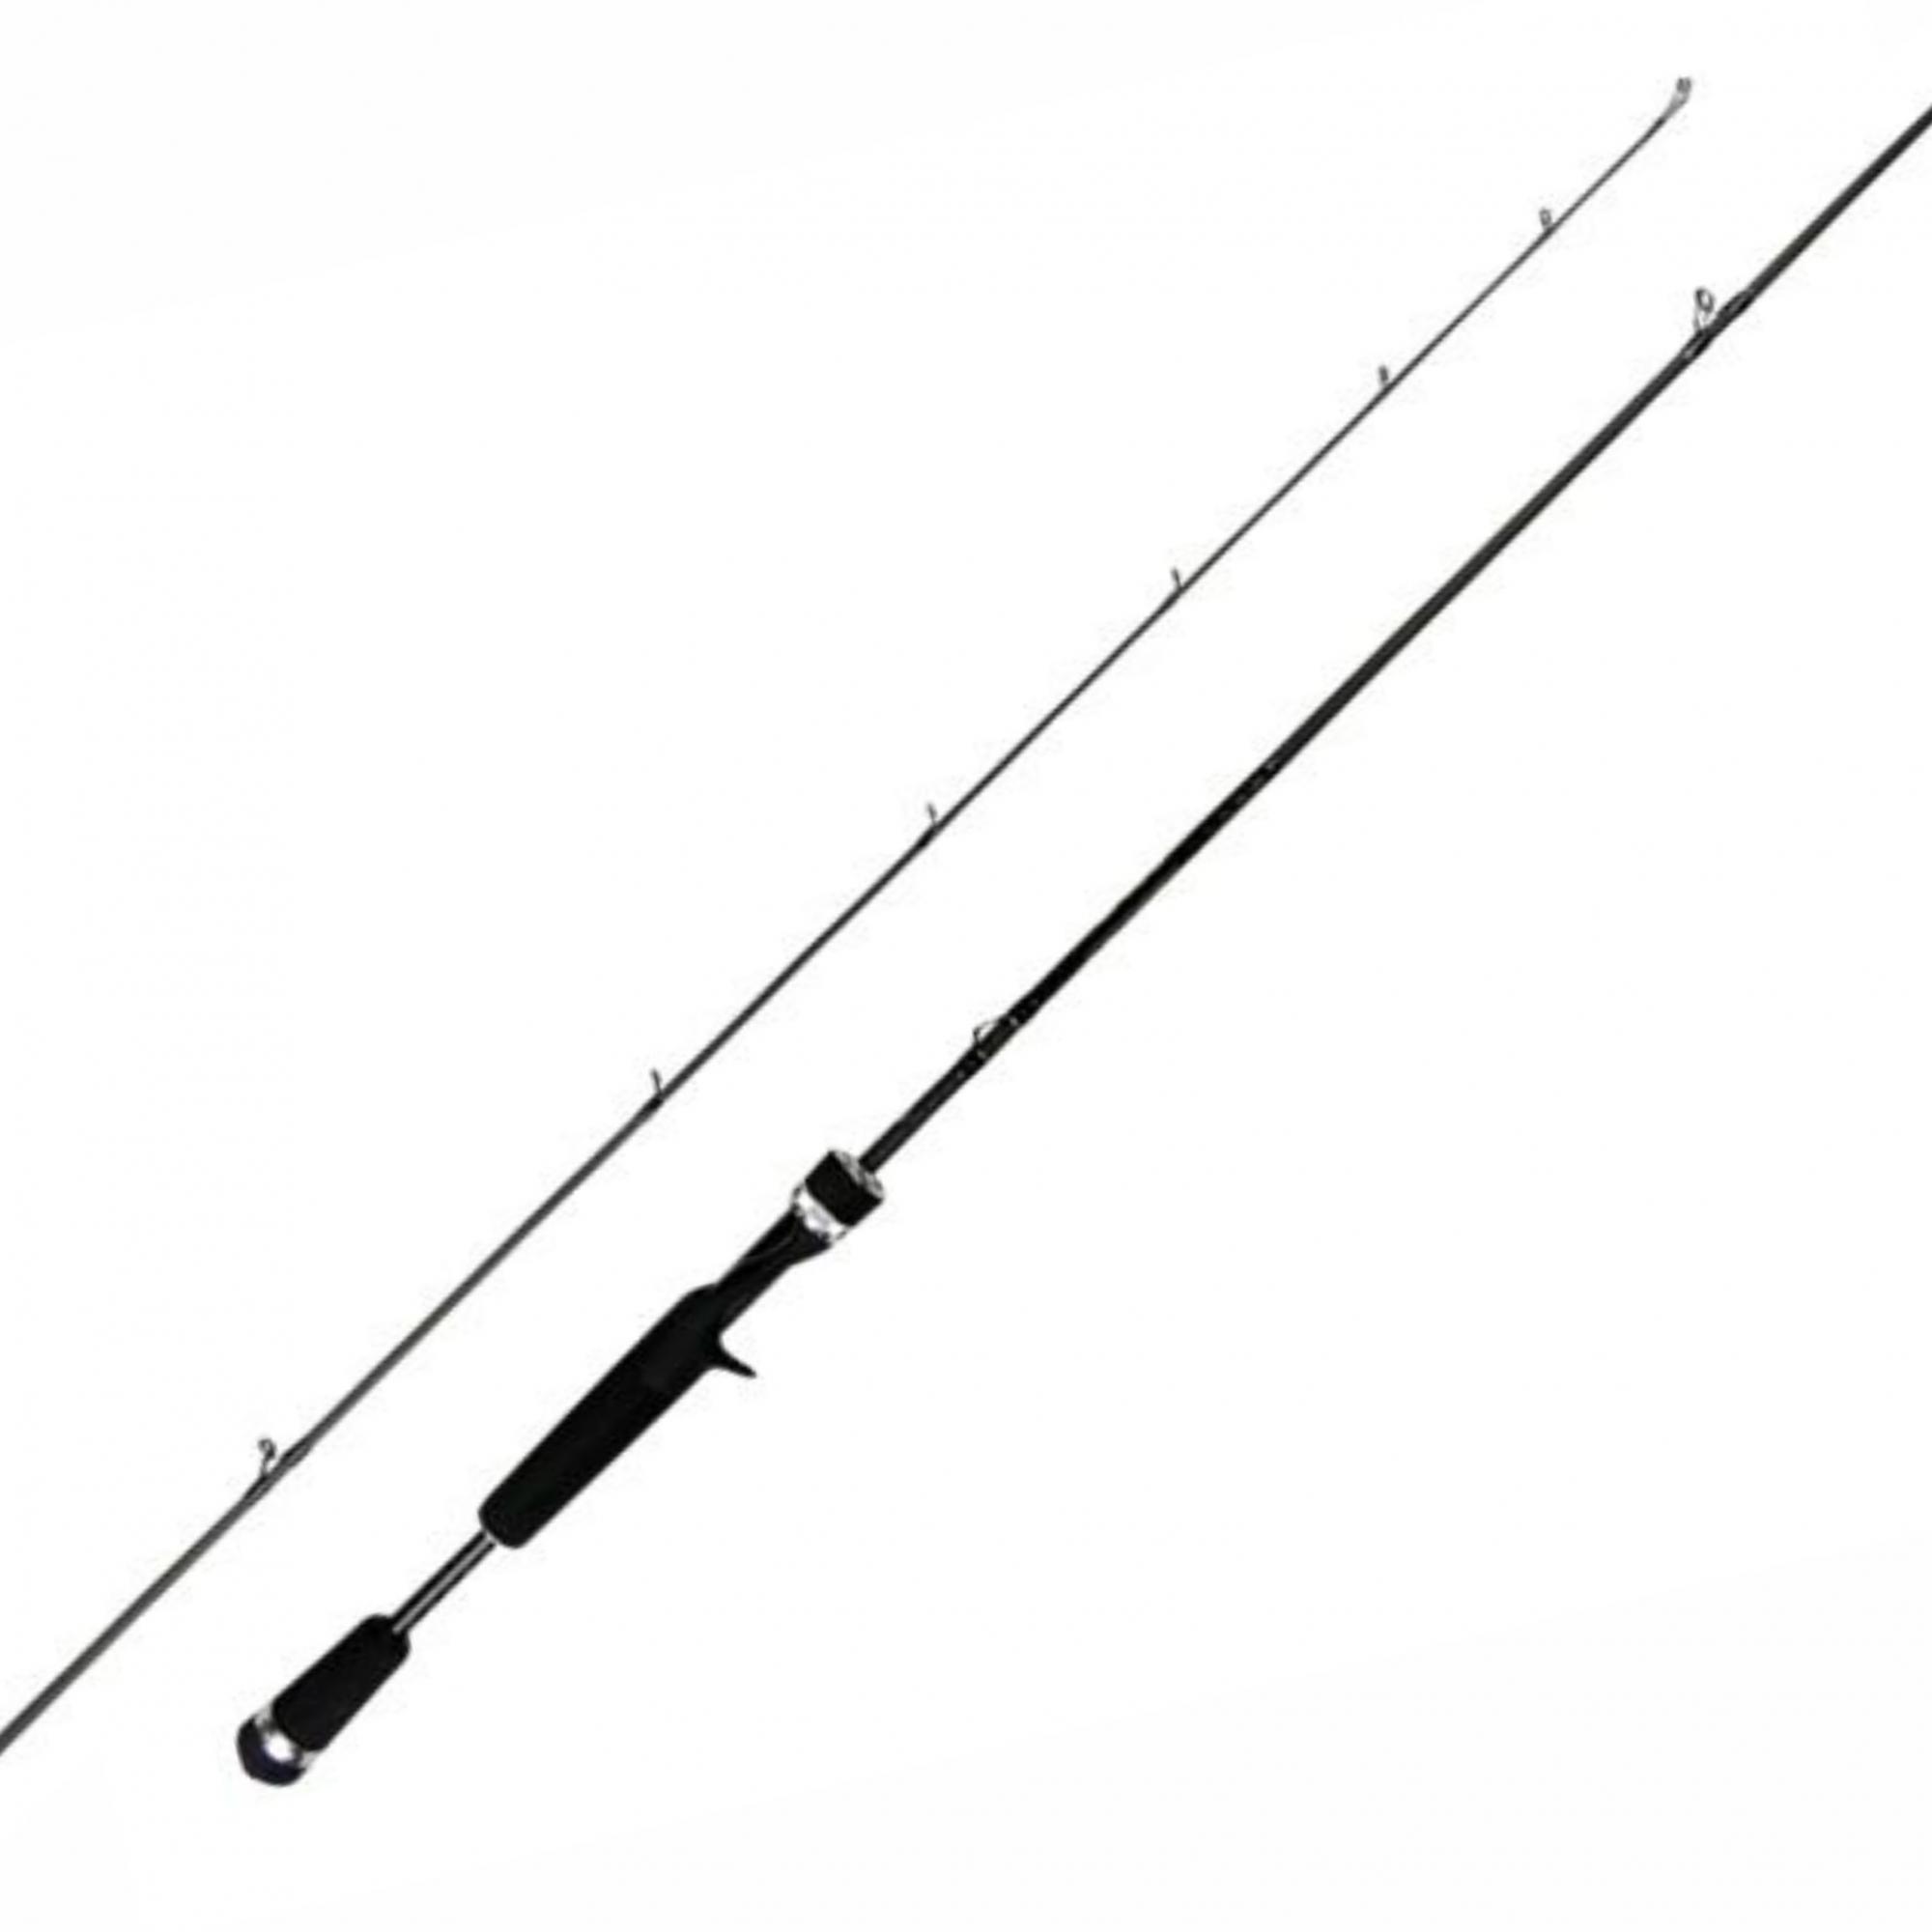 Vara 13 Fishing Fate Black 581 (1,73m) 12-20lb Para Carretilha  - Pesca Adventure